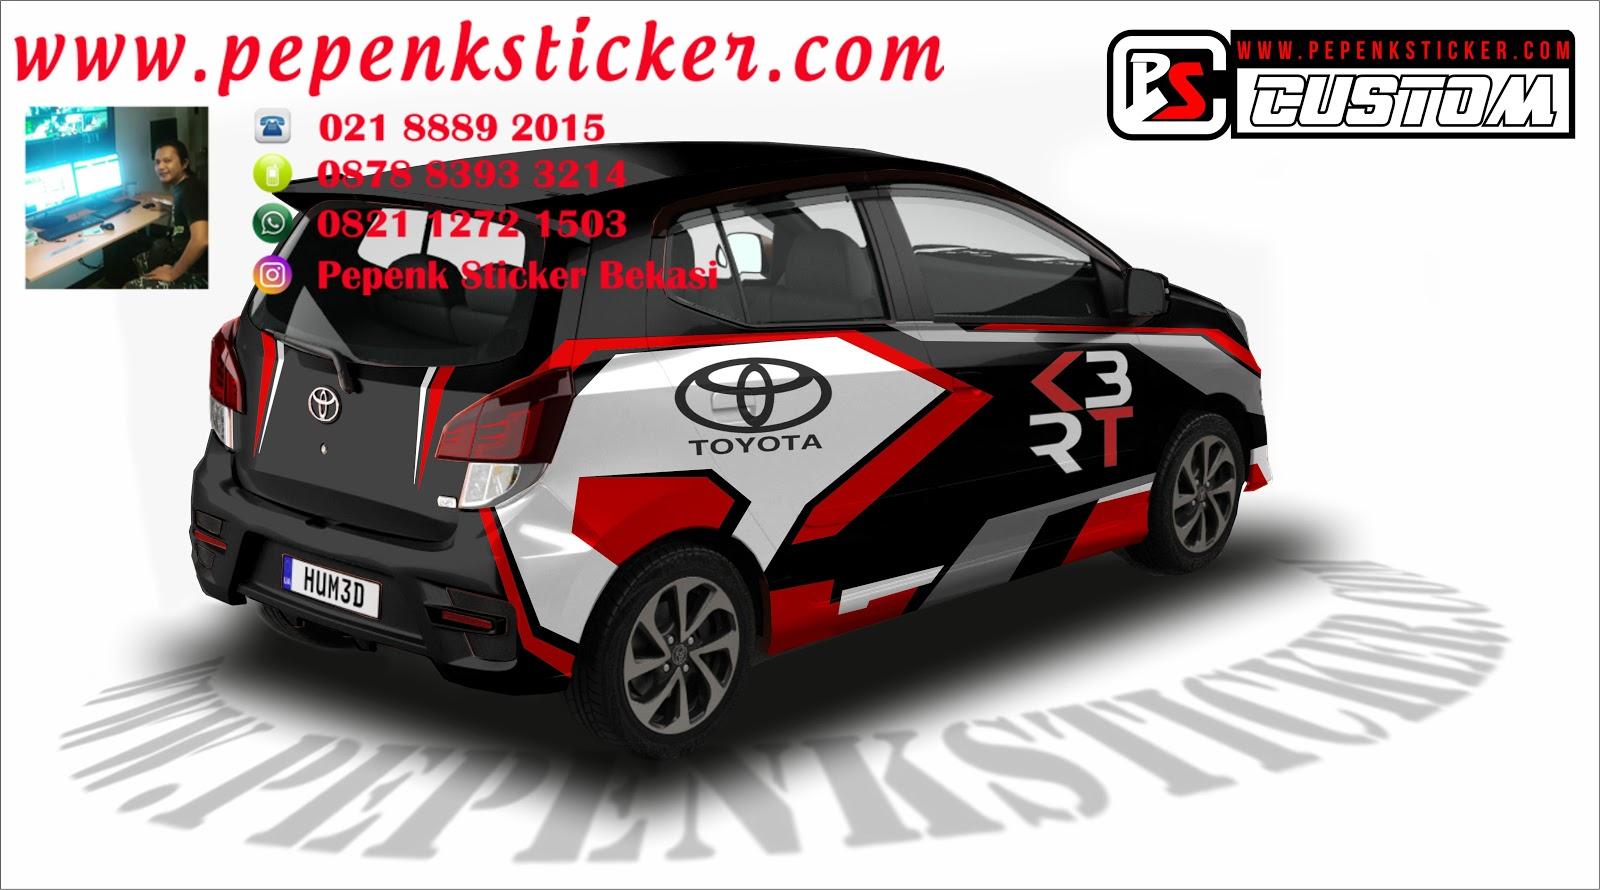 81 Modifikasi Cutting Sticker Mobil Agya Gratis Terbaru